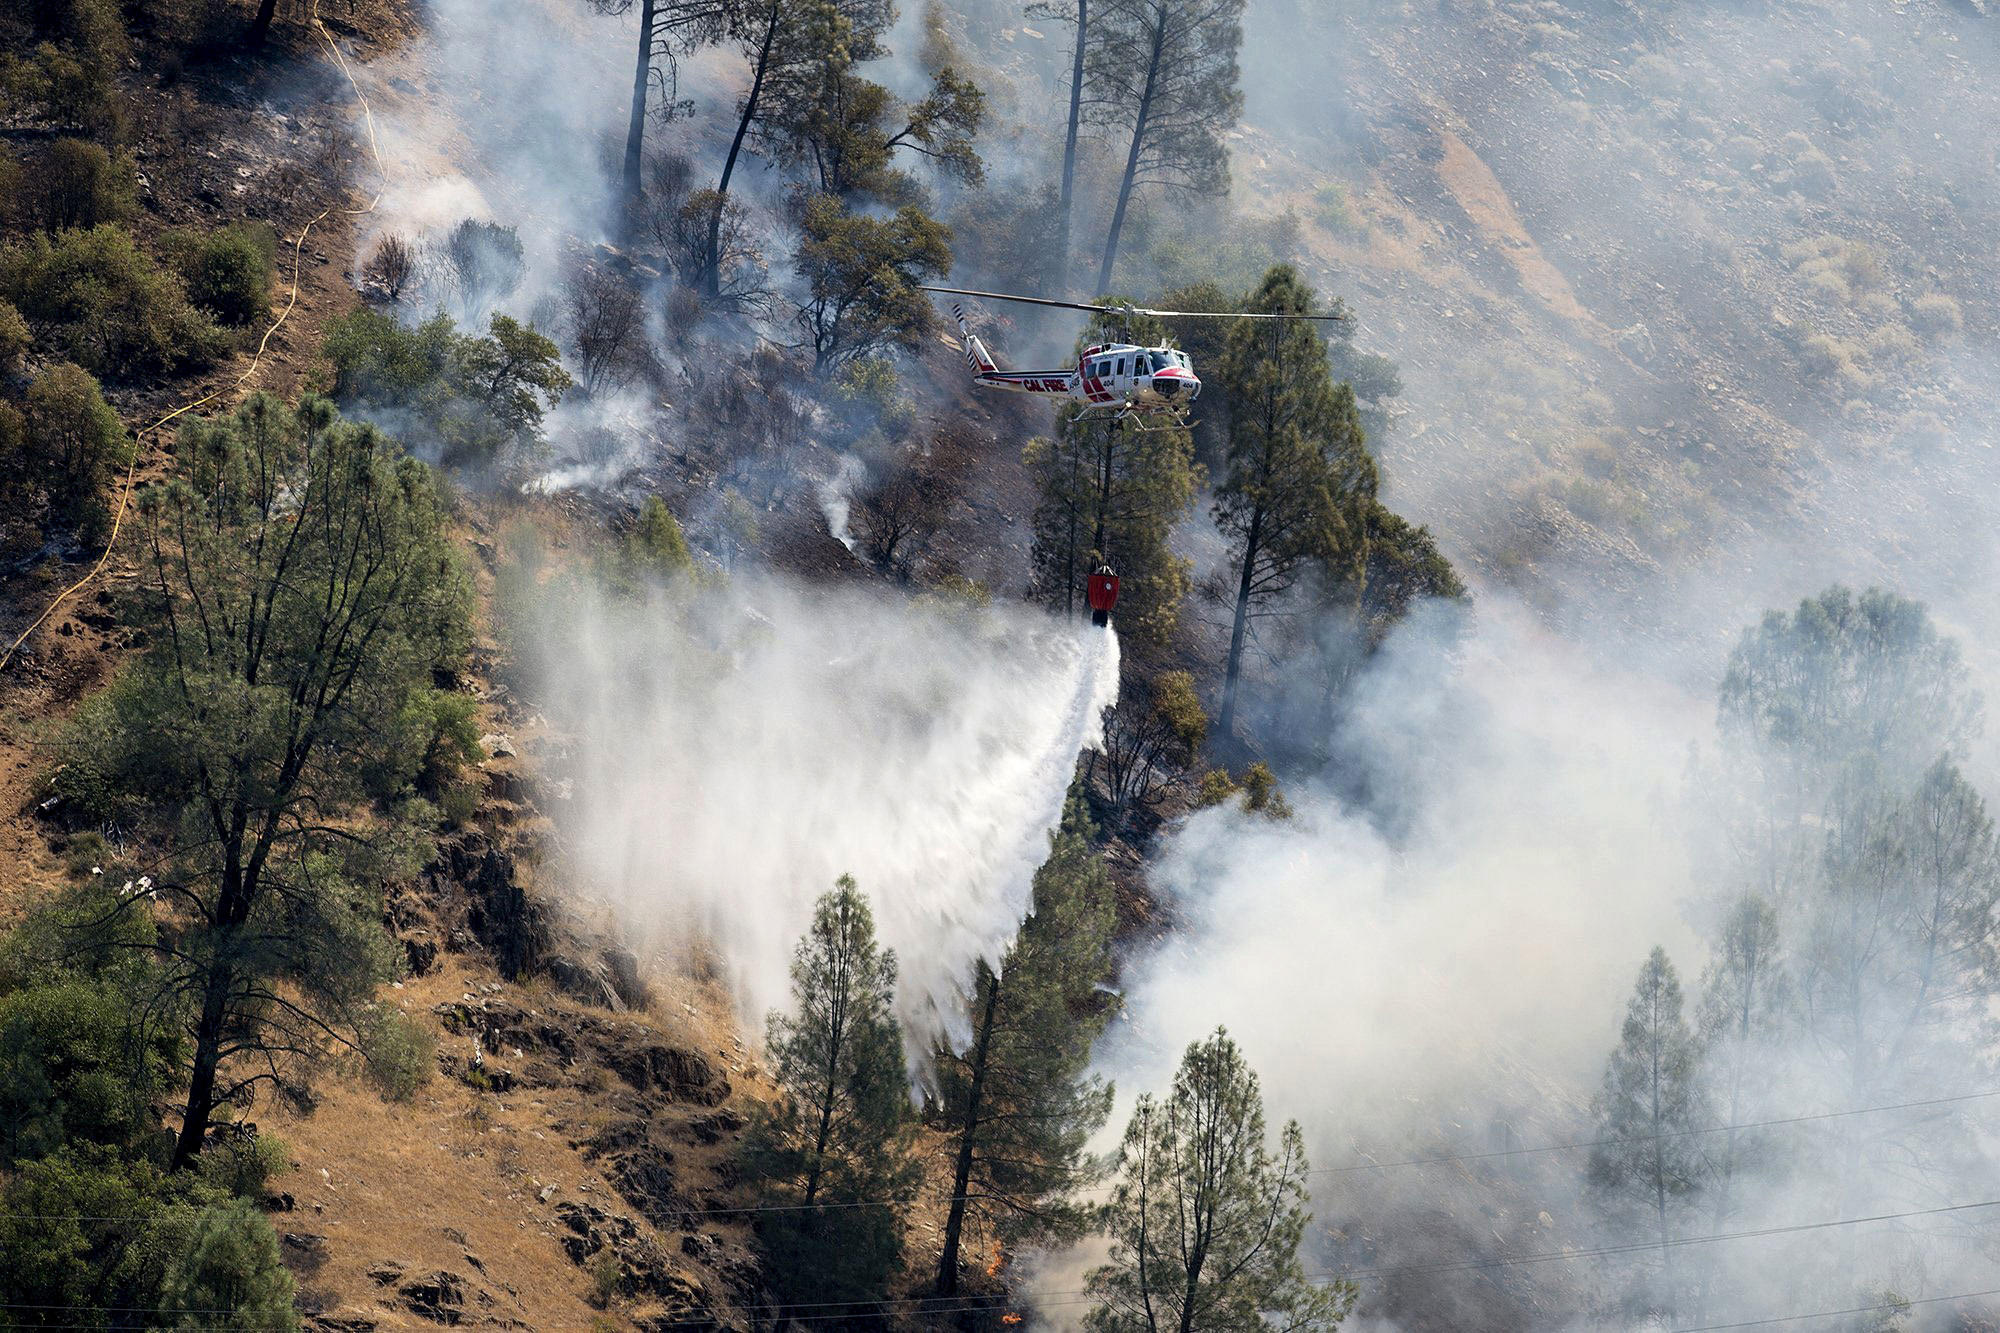 Ferguson Fire California Map.Second Generation Firefighter Killed Battling Ferguson Fire Near